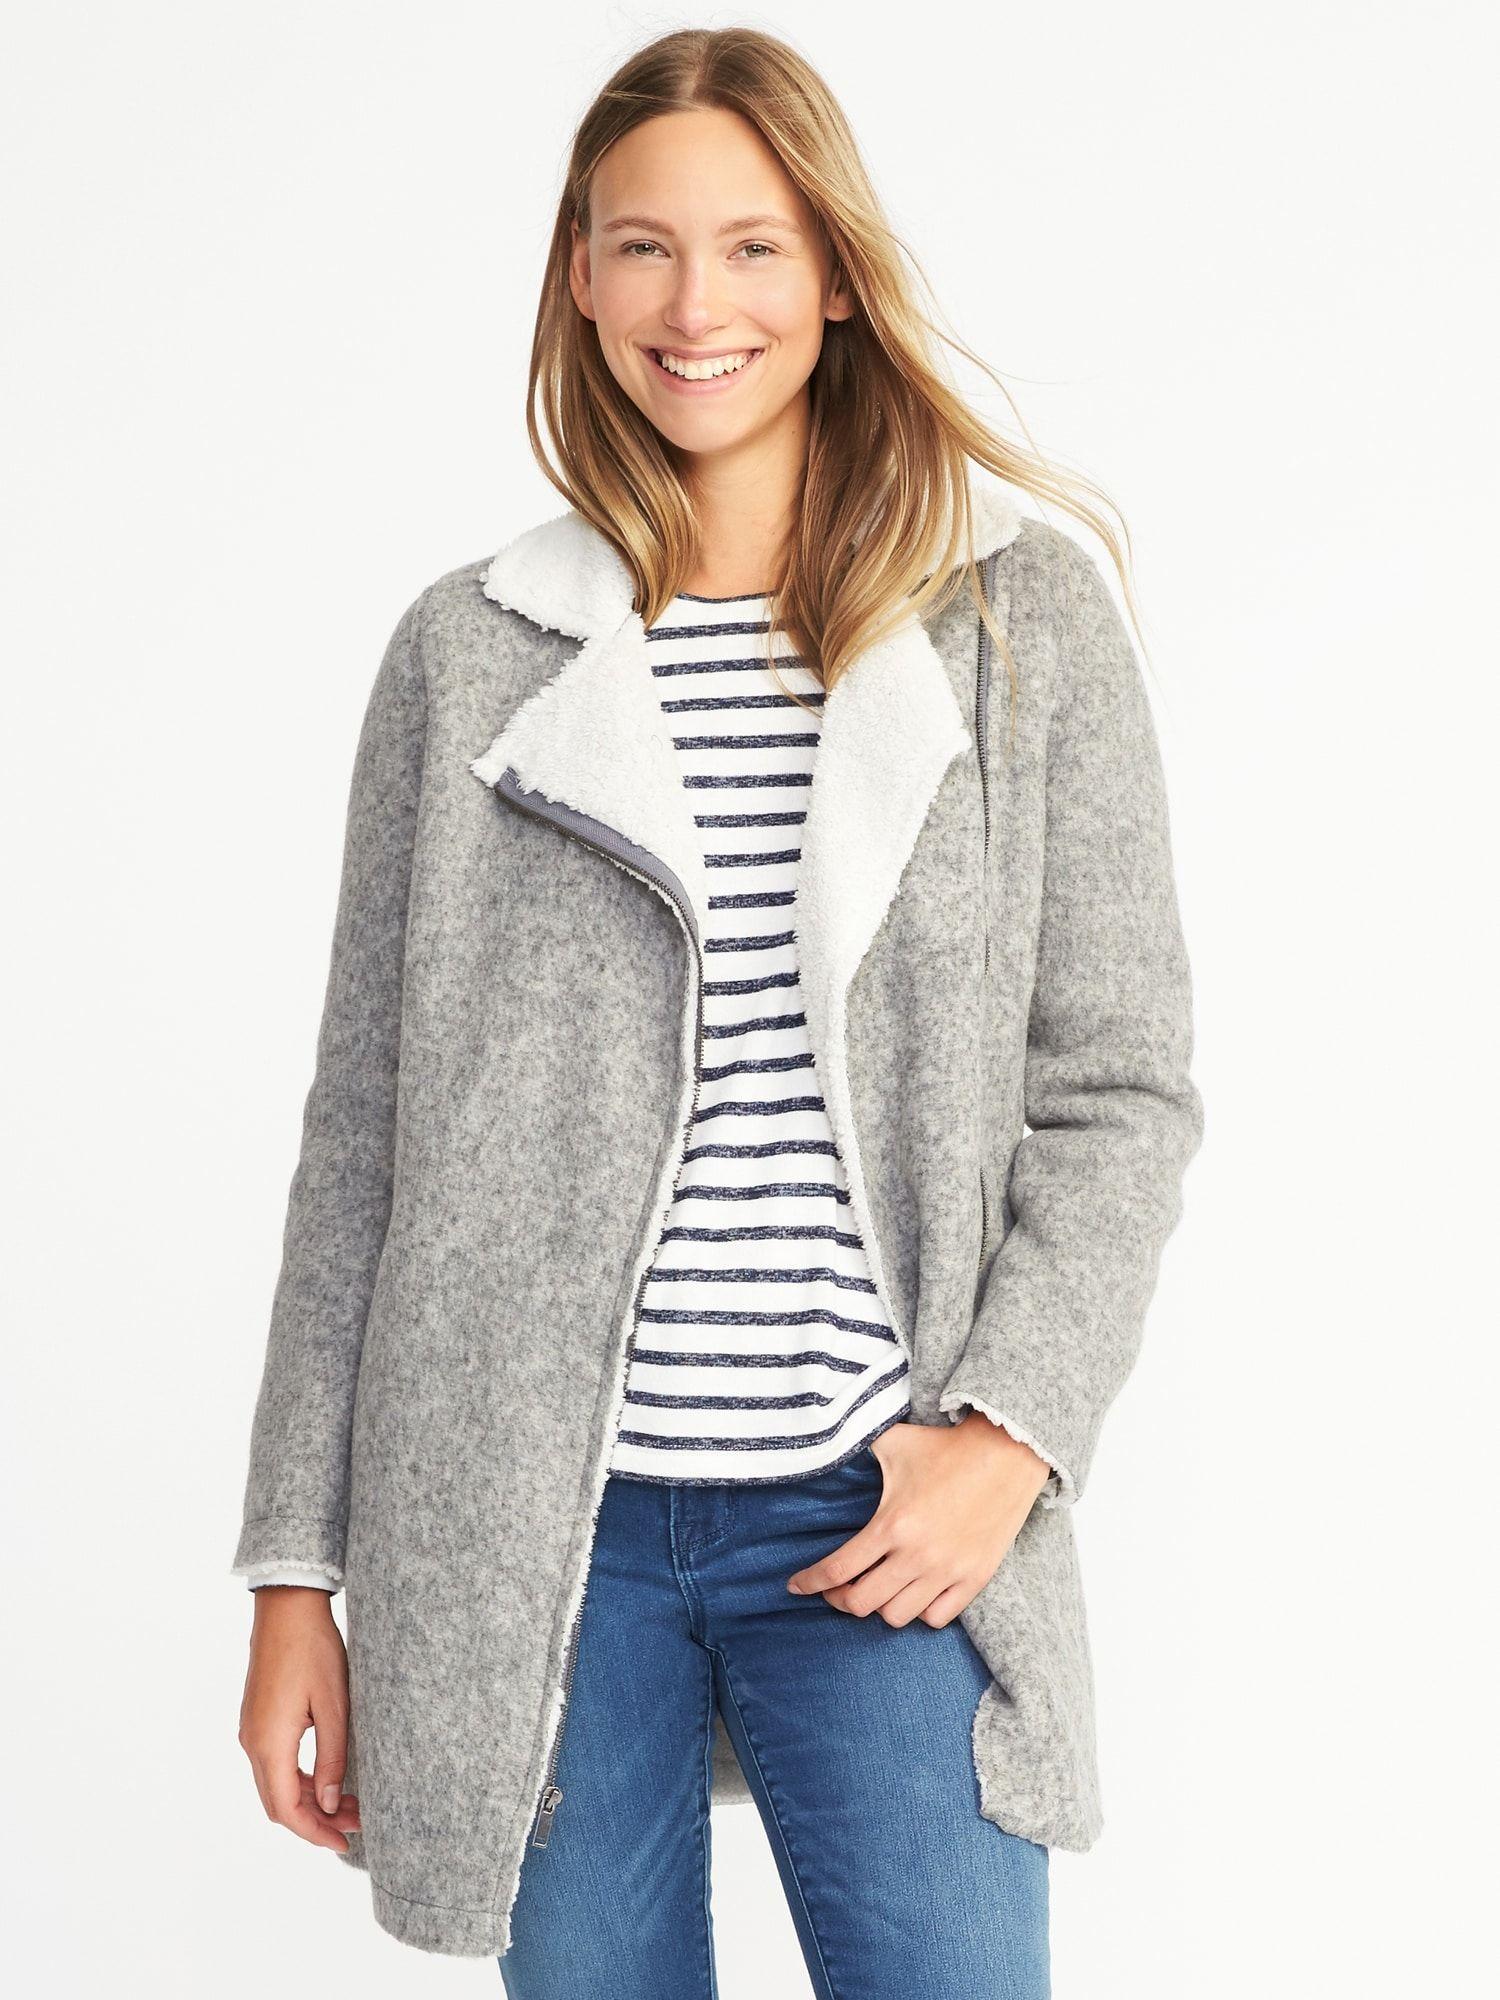 e96c85c4607 Long Sherpa-Lined Moto Jacket for Women